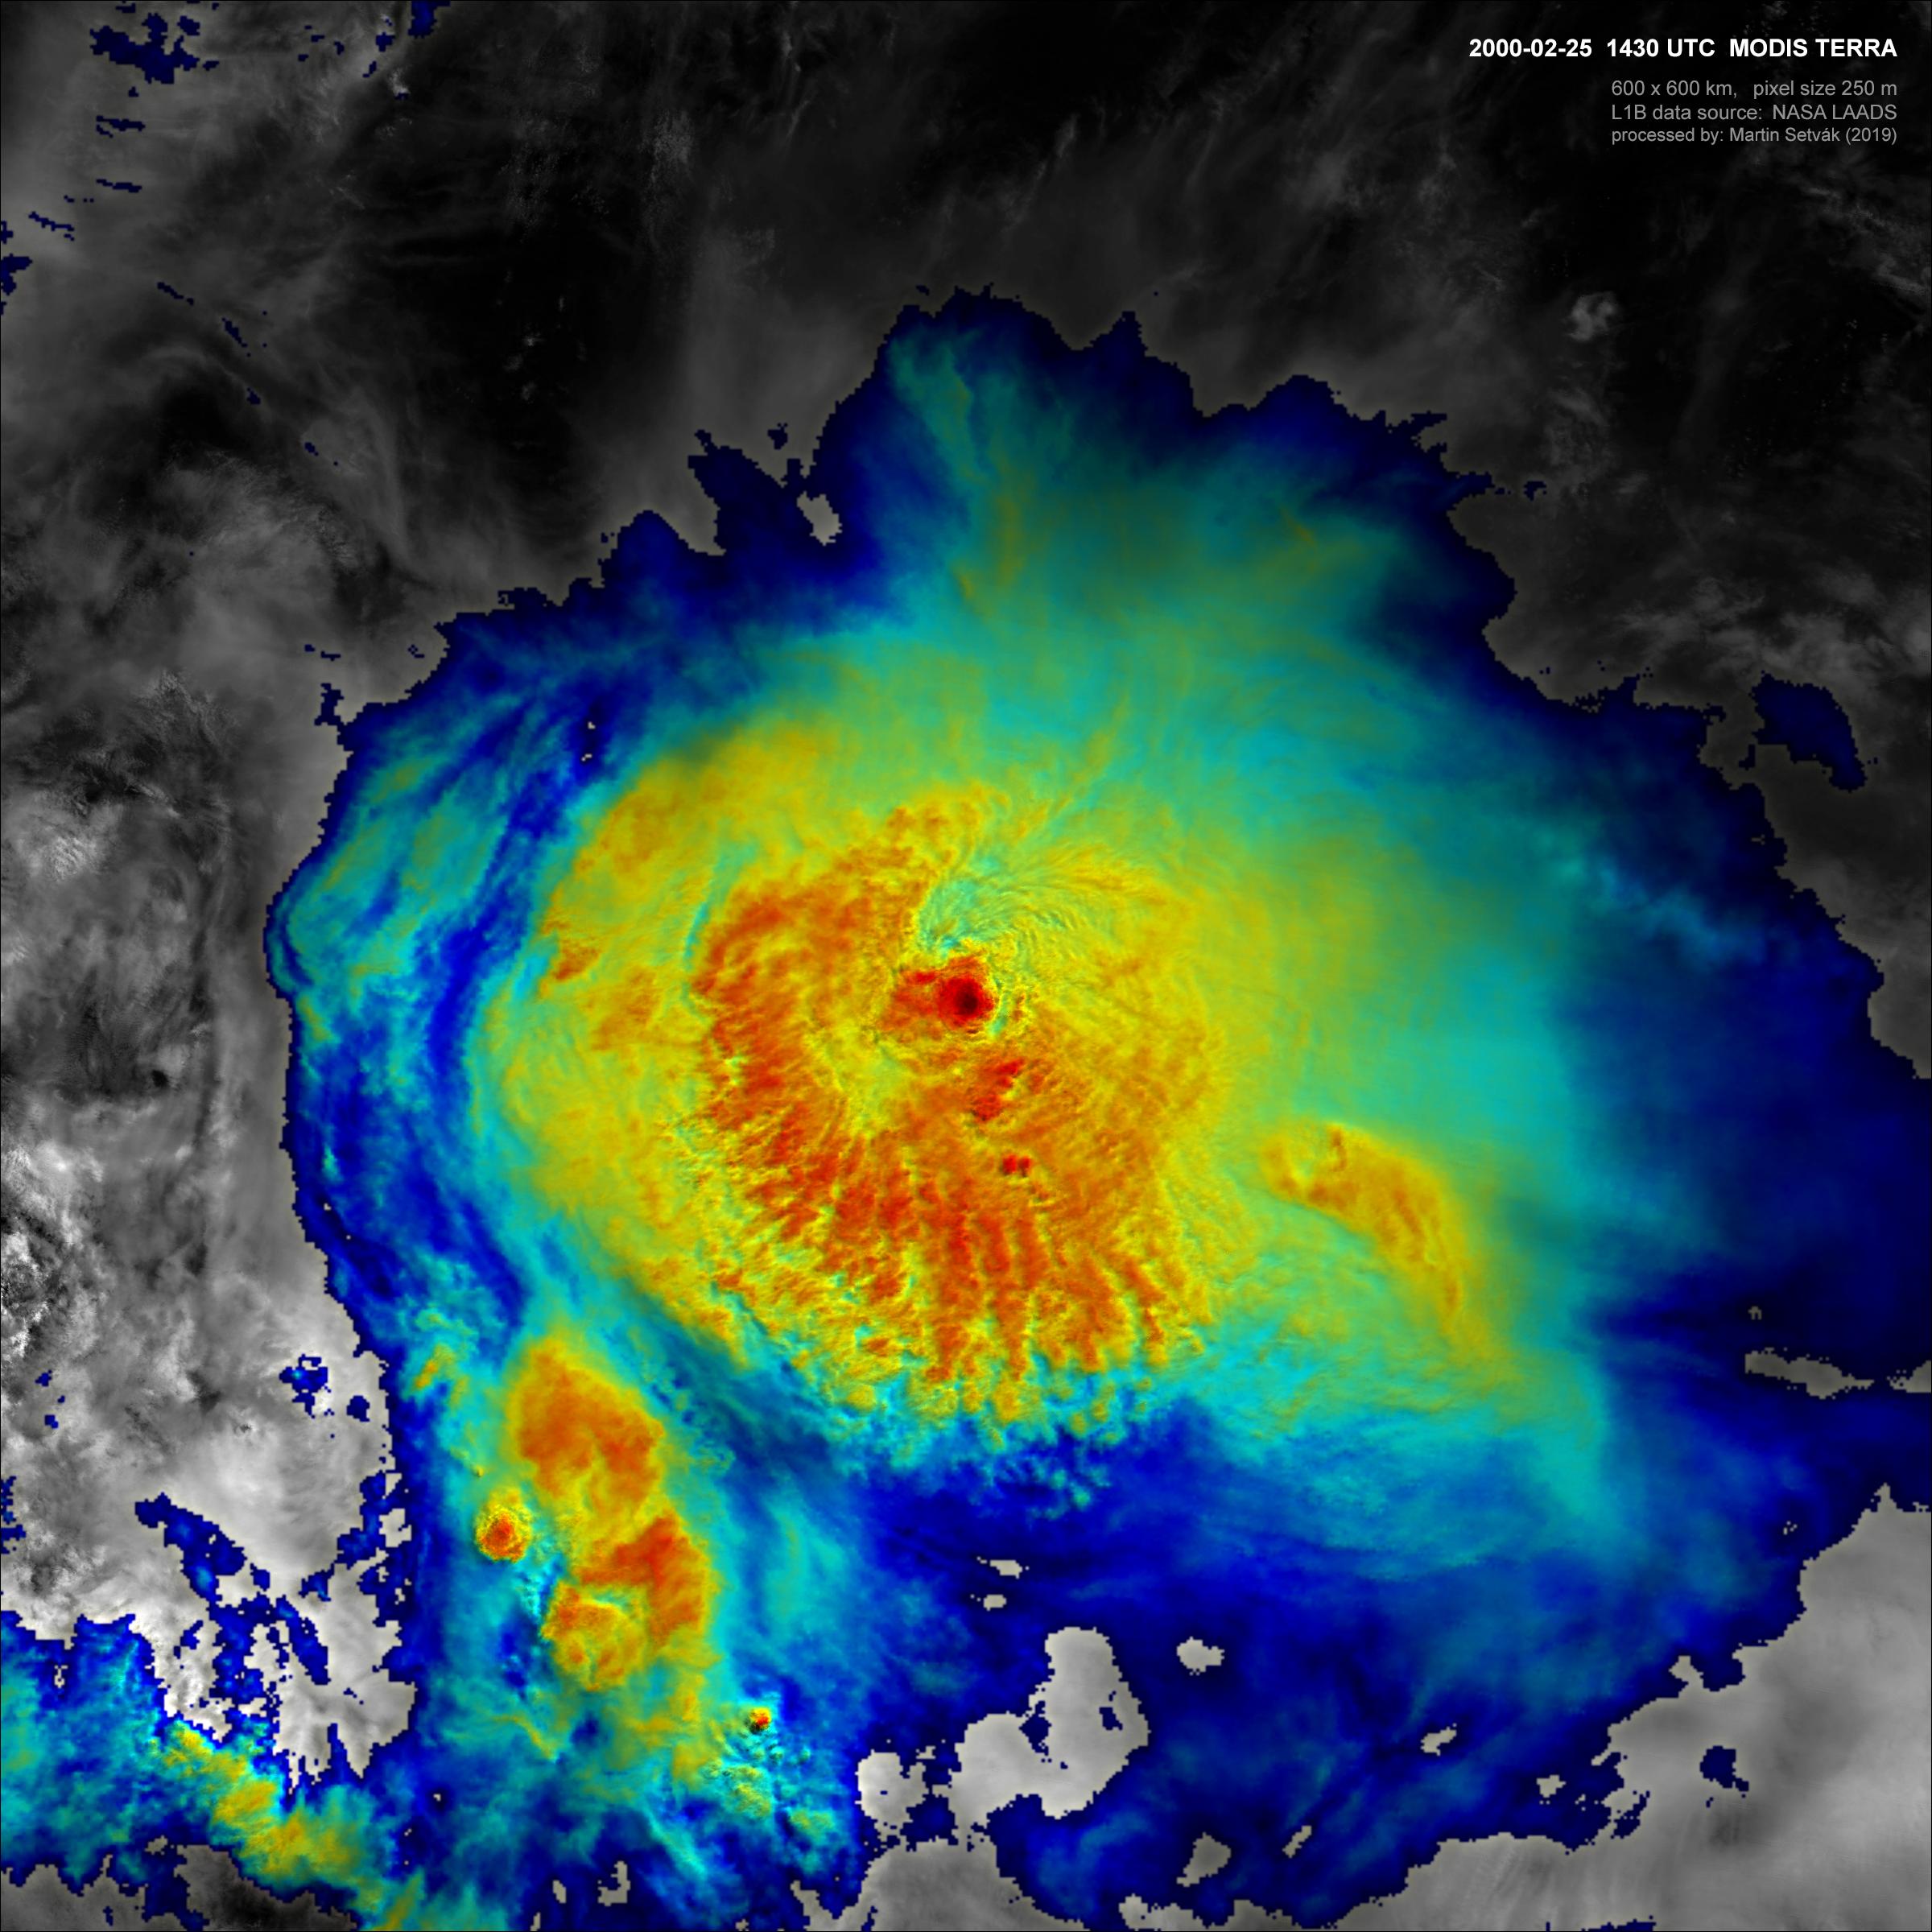 MODIS Sandwich Product, 25 Feb 2000, 14:30 UTC, Argentina